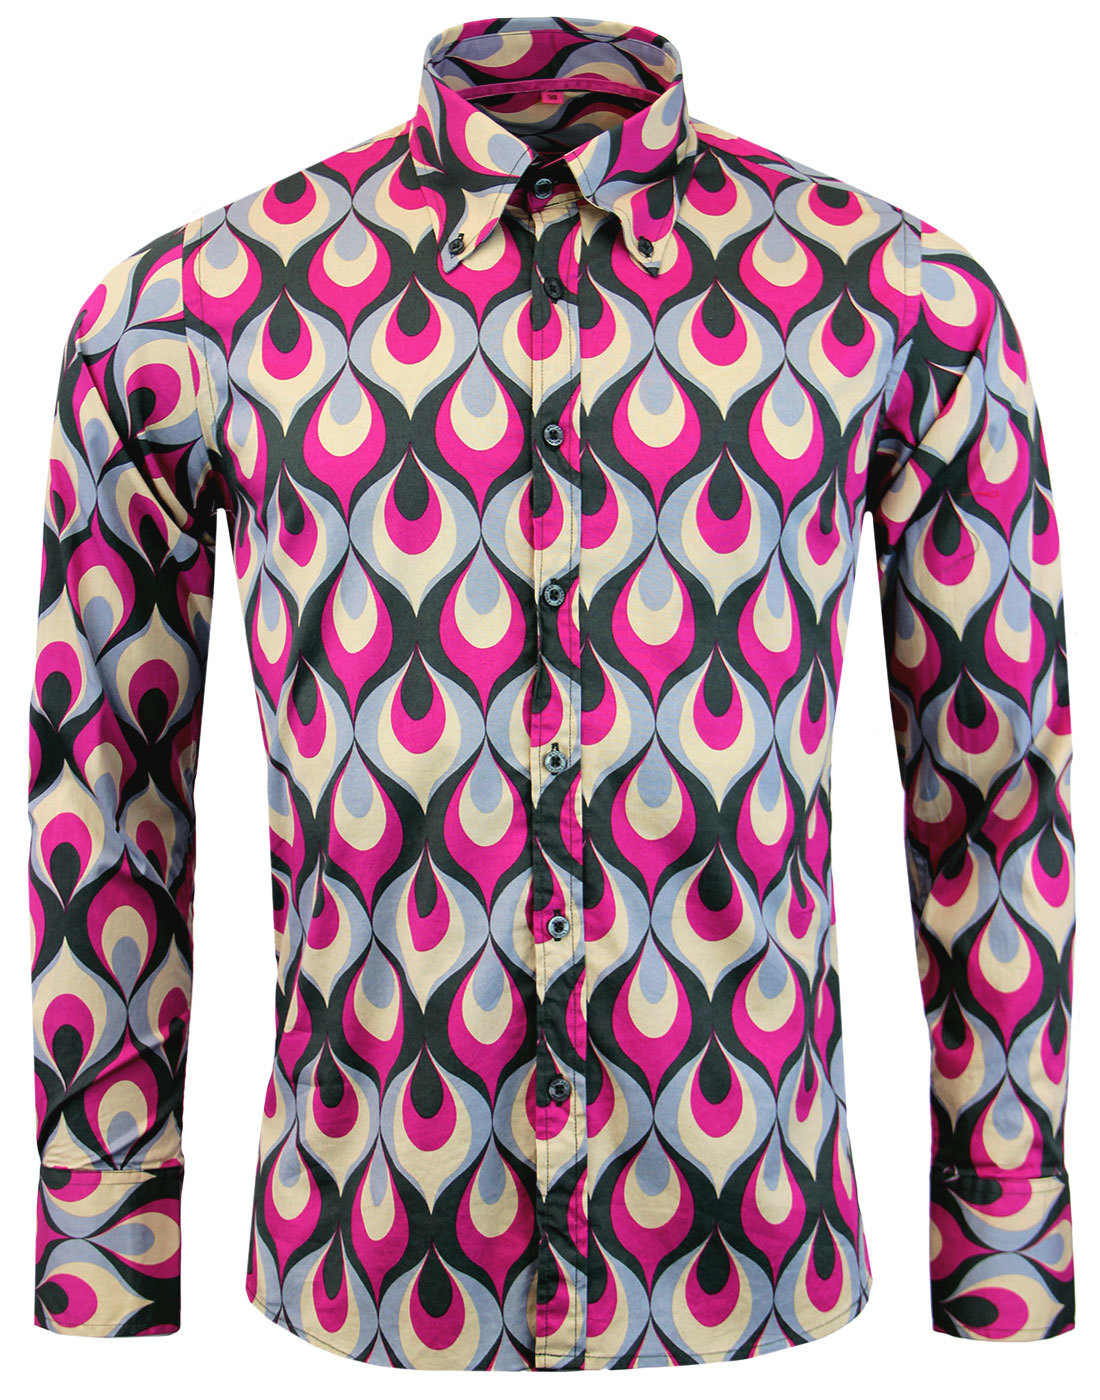 madcap england trip flames 60s mod geo print shirt